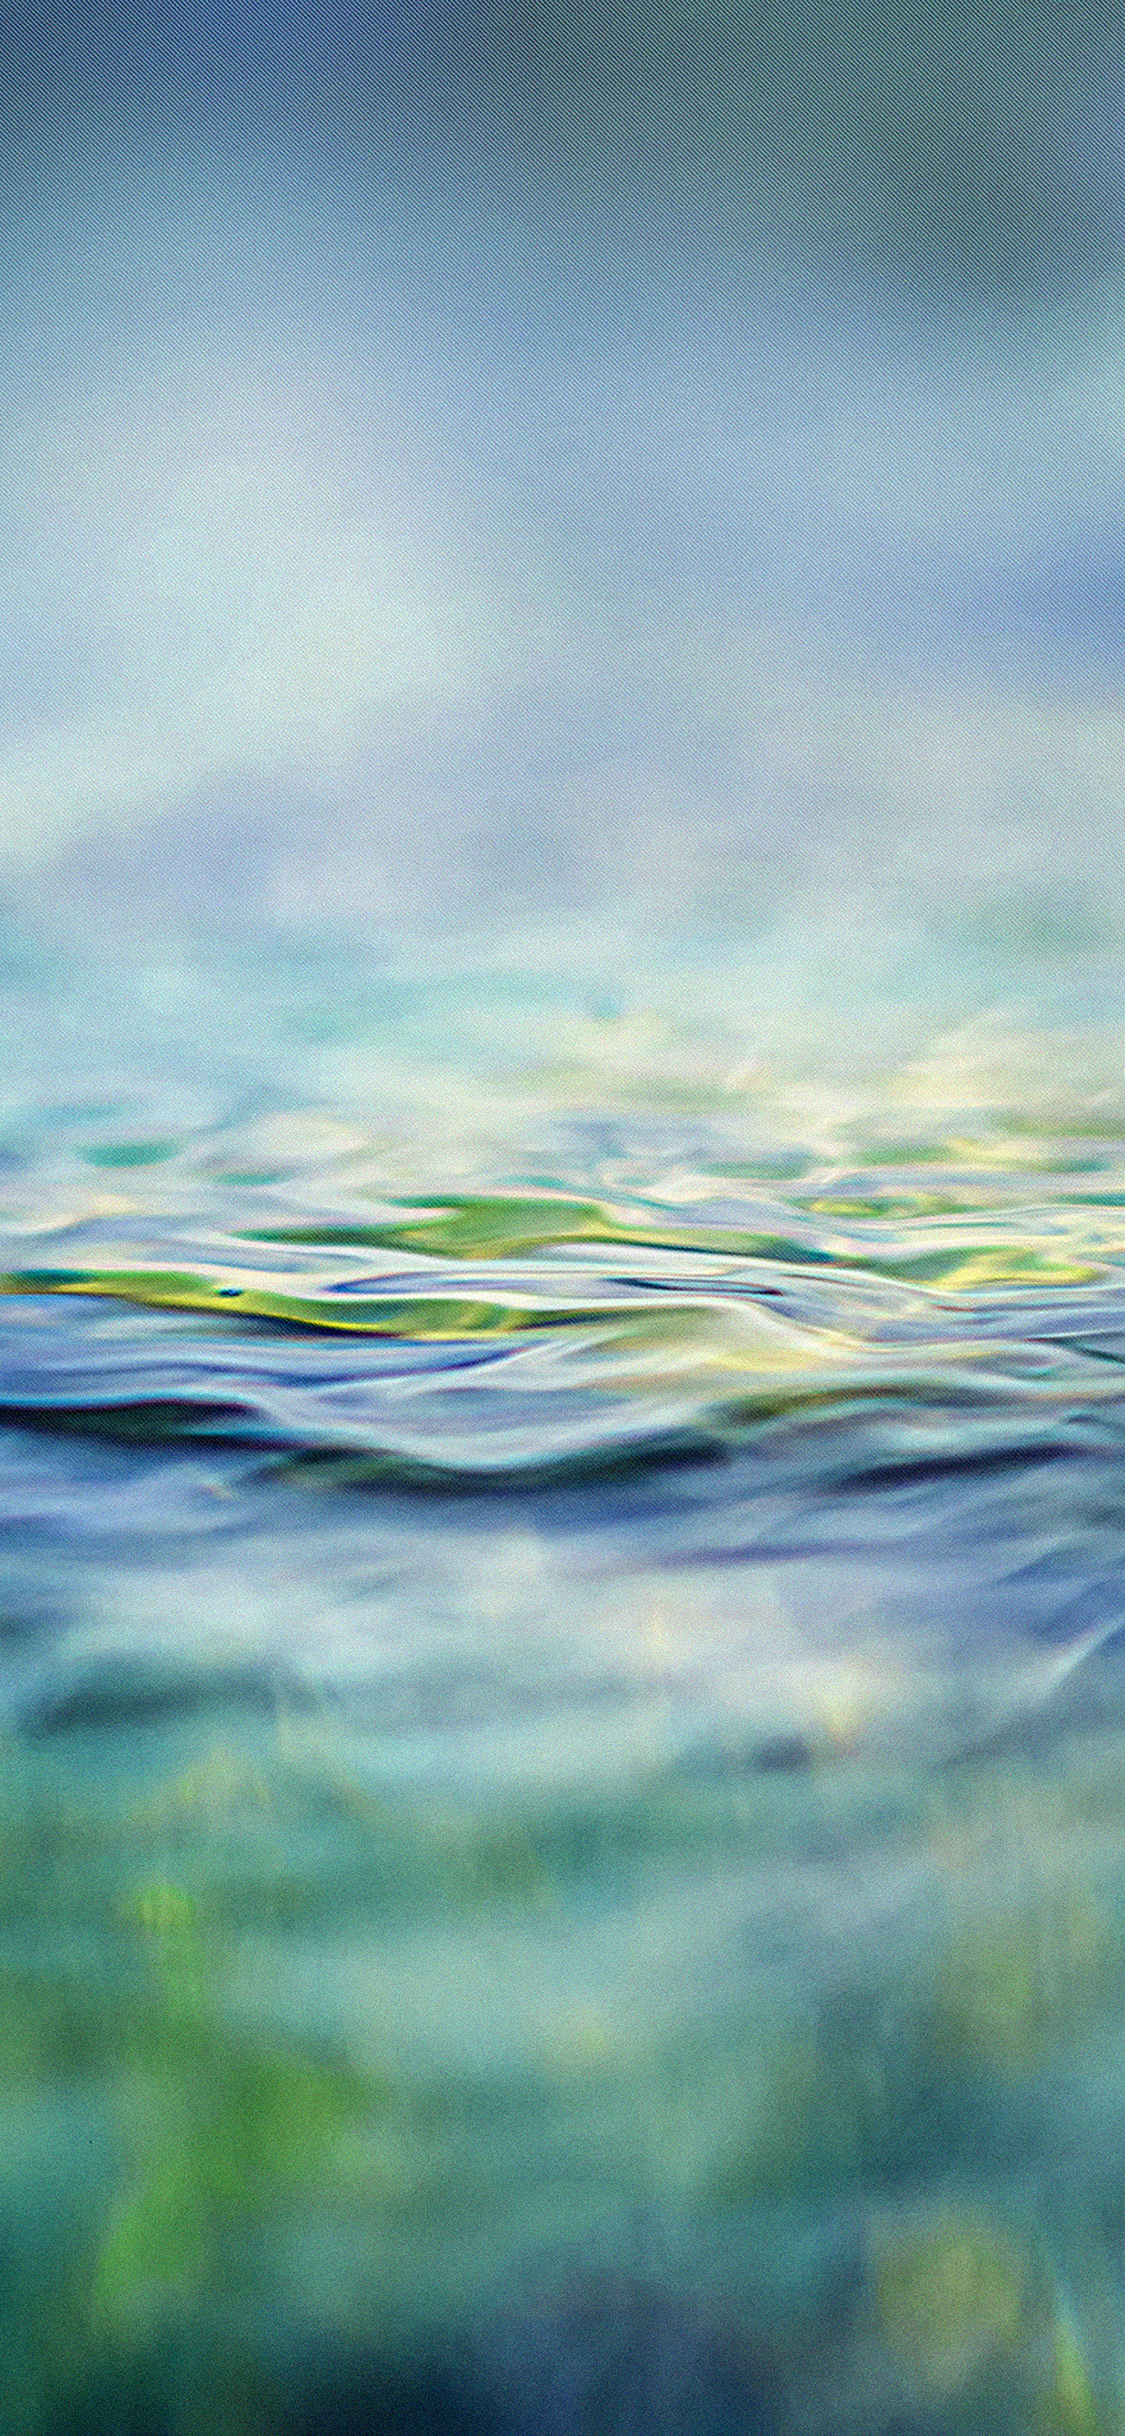 iPhoneXpapers.com-Apple-iPhone-wallpaper-vb85-wallpaper-flowing-river-before-sunrise-pattern